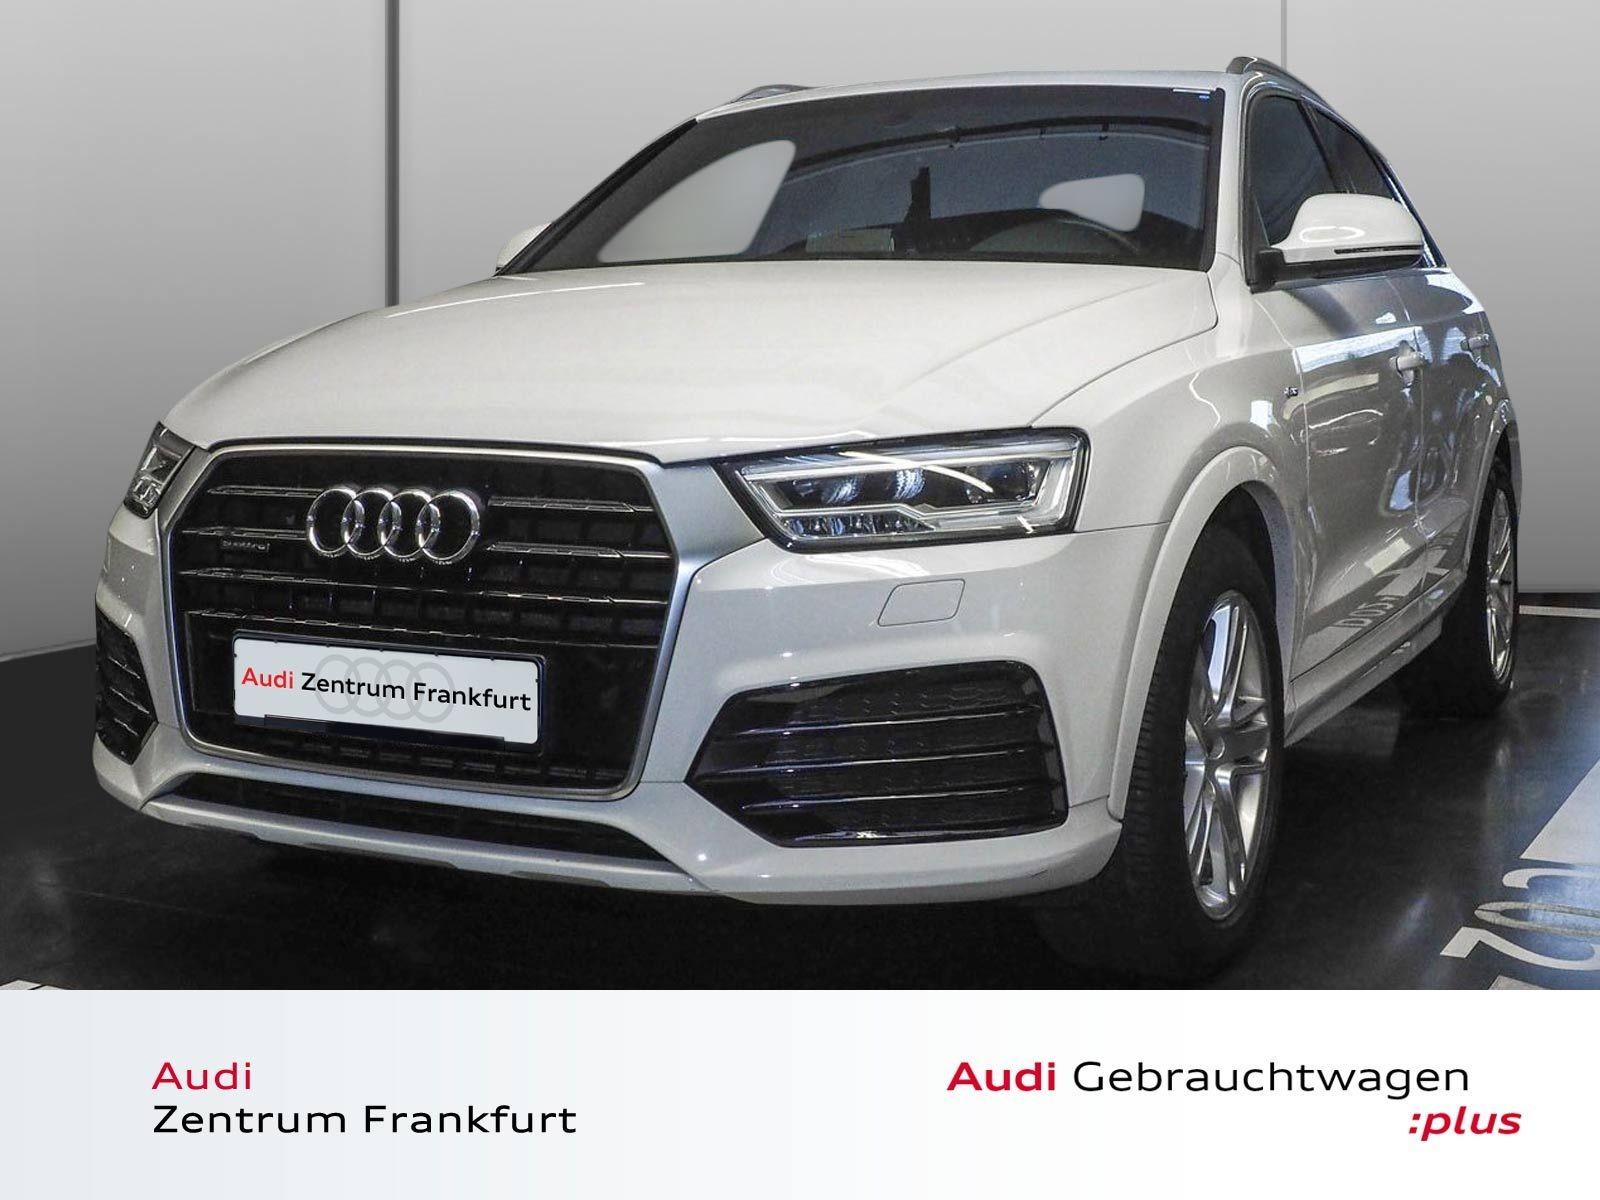 Audi Q3 2.0 TDI quattro S tronic S line Navi Panorama LED Sitzheizung, Jahr 2016, Diesel